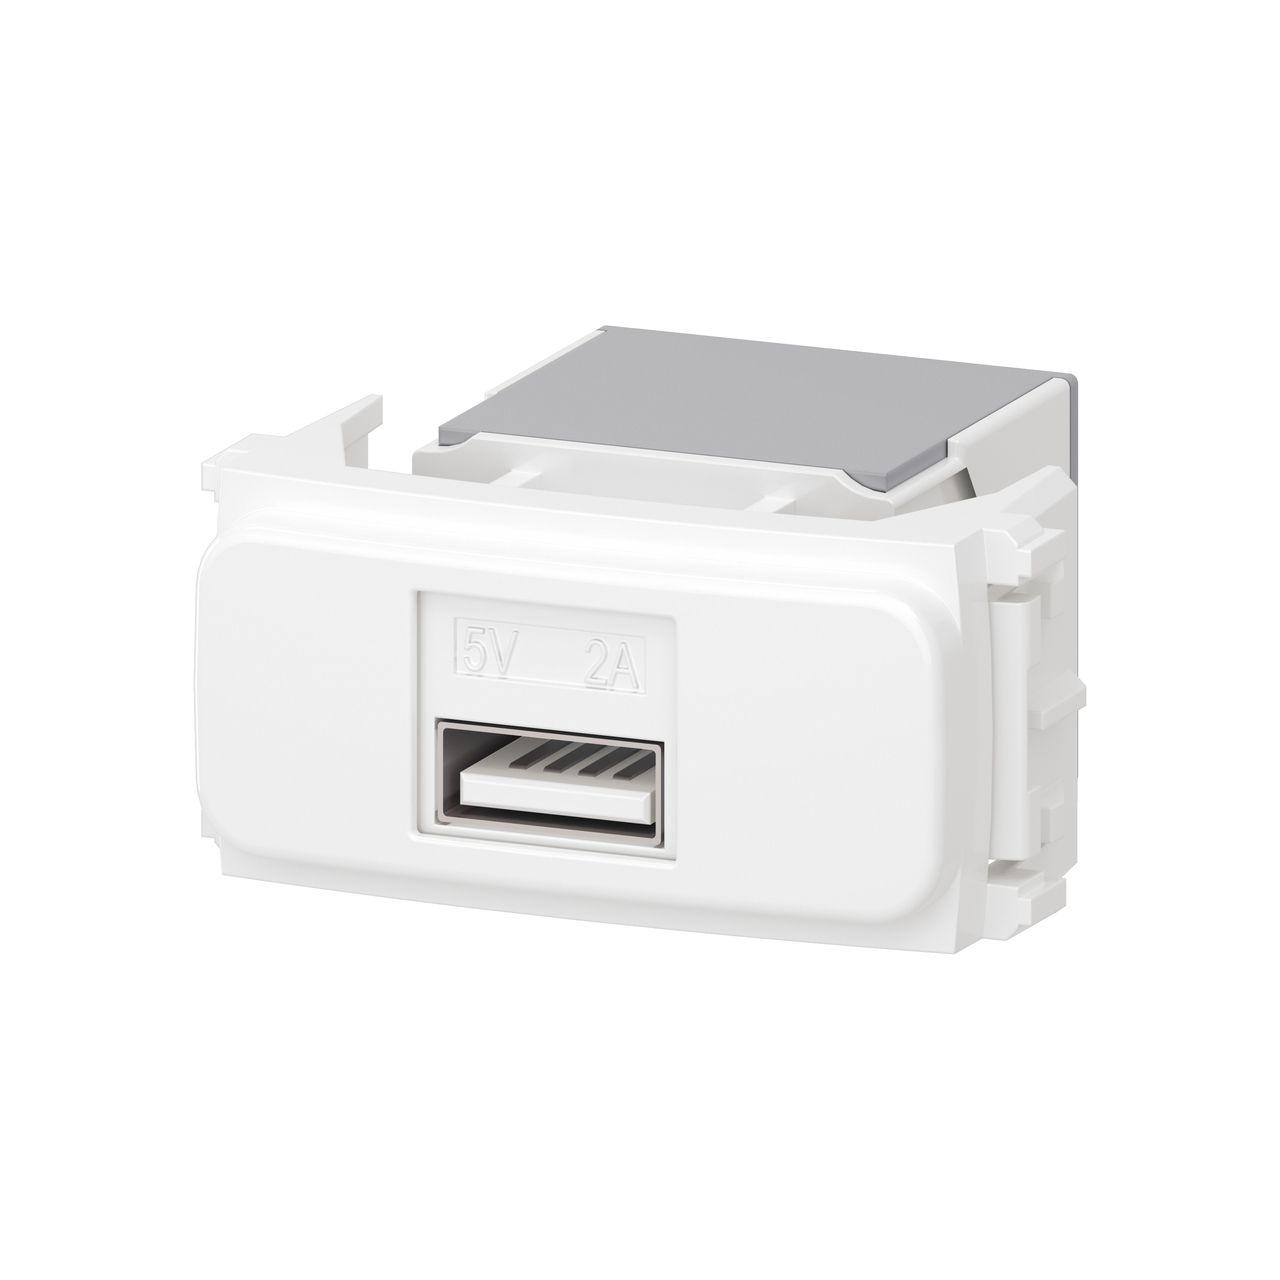 CARREGADOR KEYSTONE USB PLACA 4X2 COMPOSÉ BR